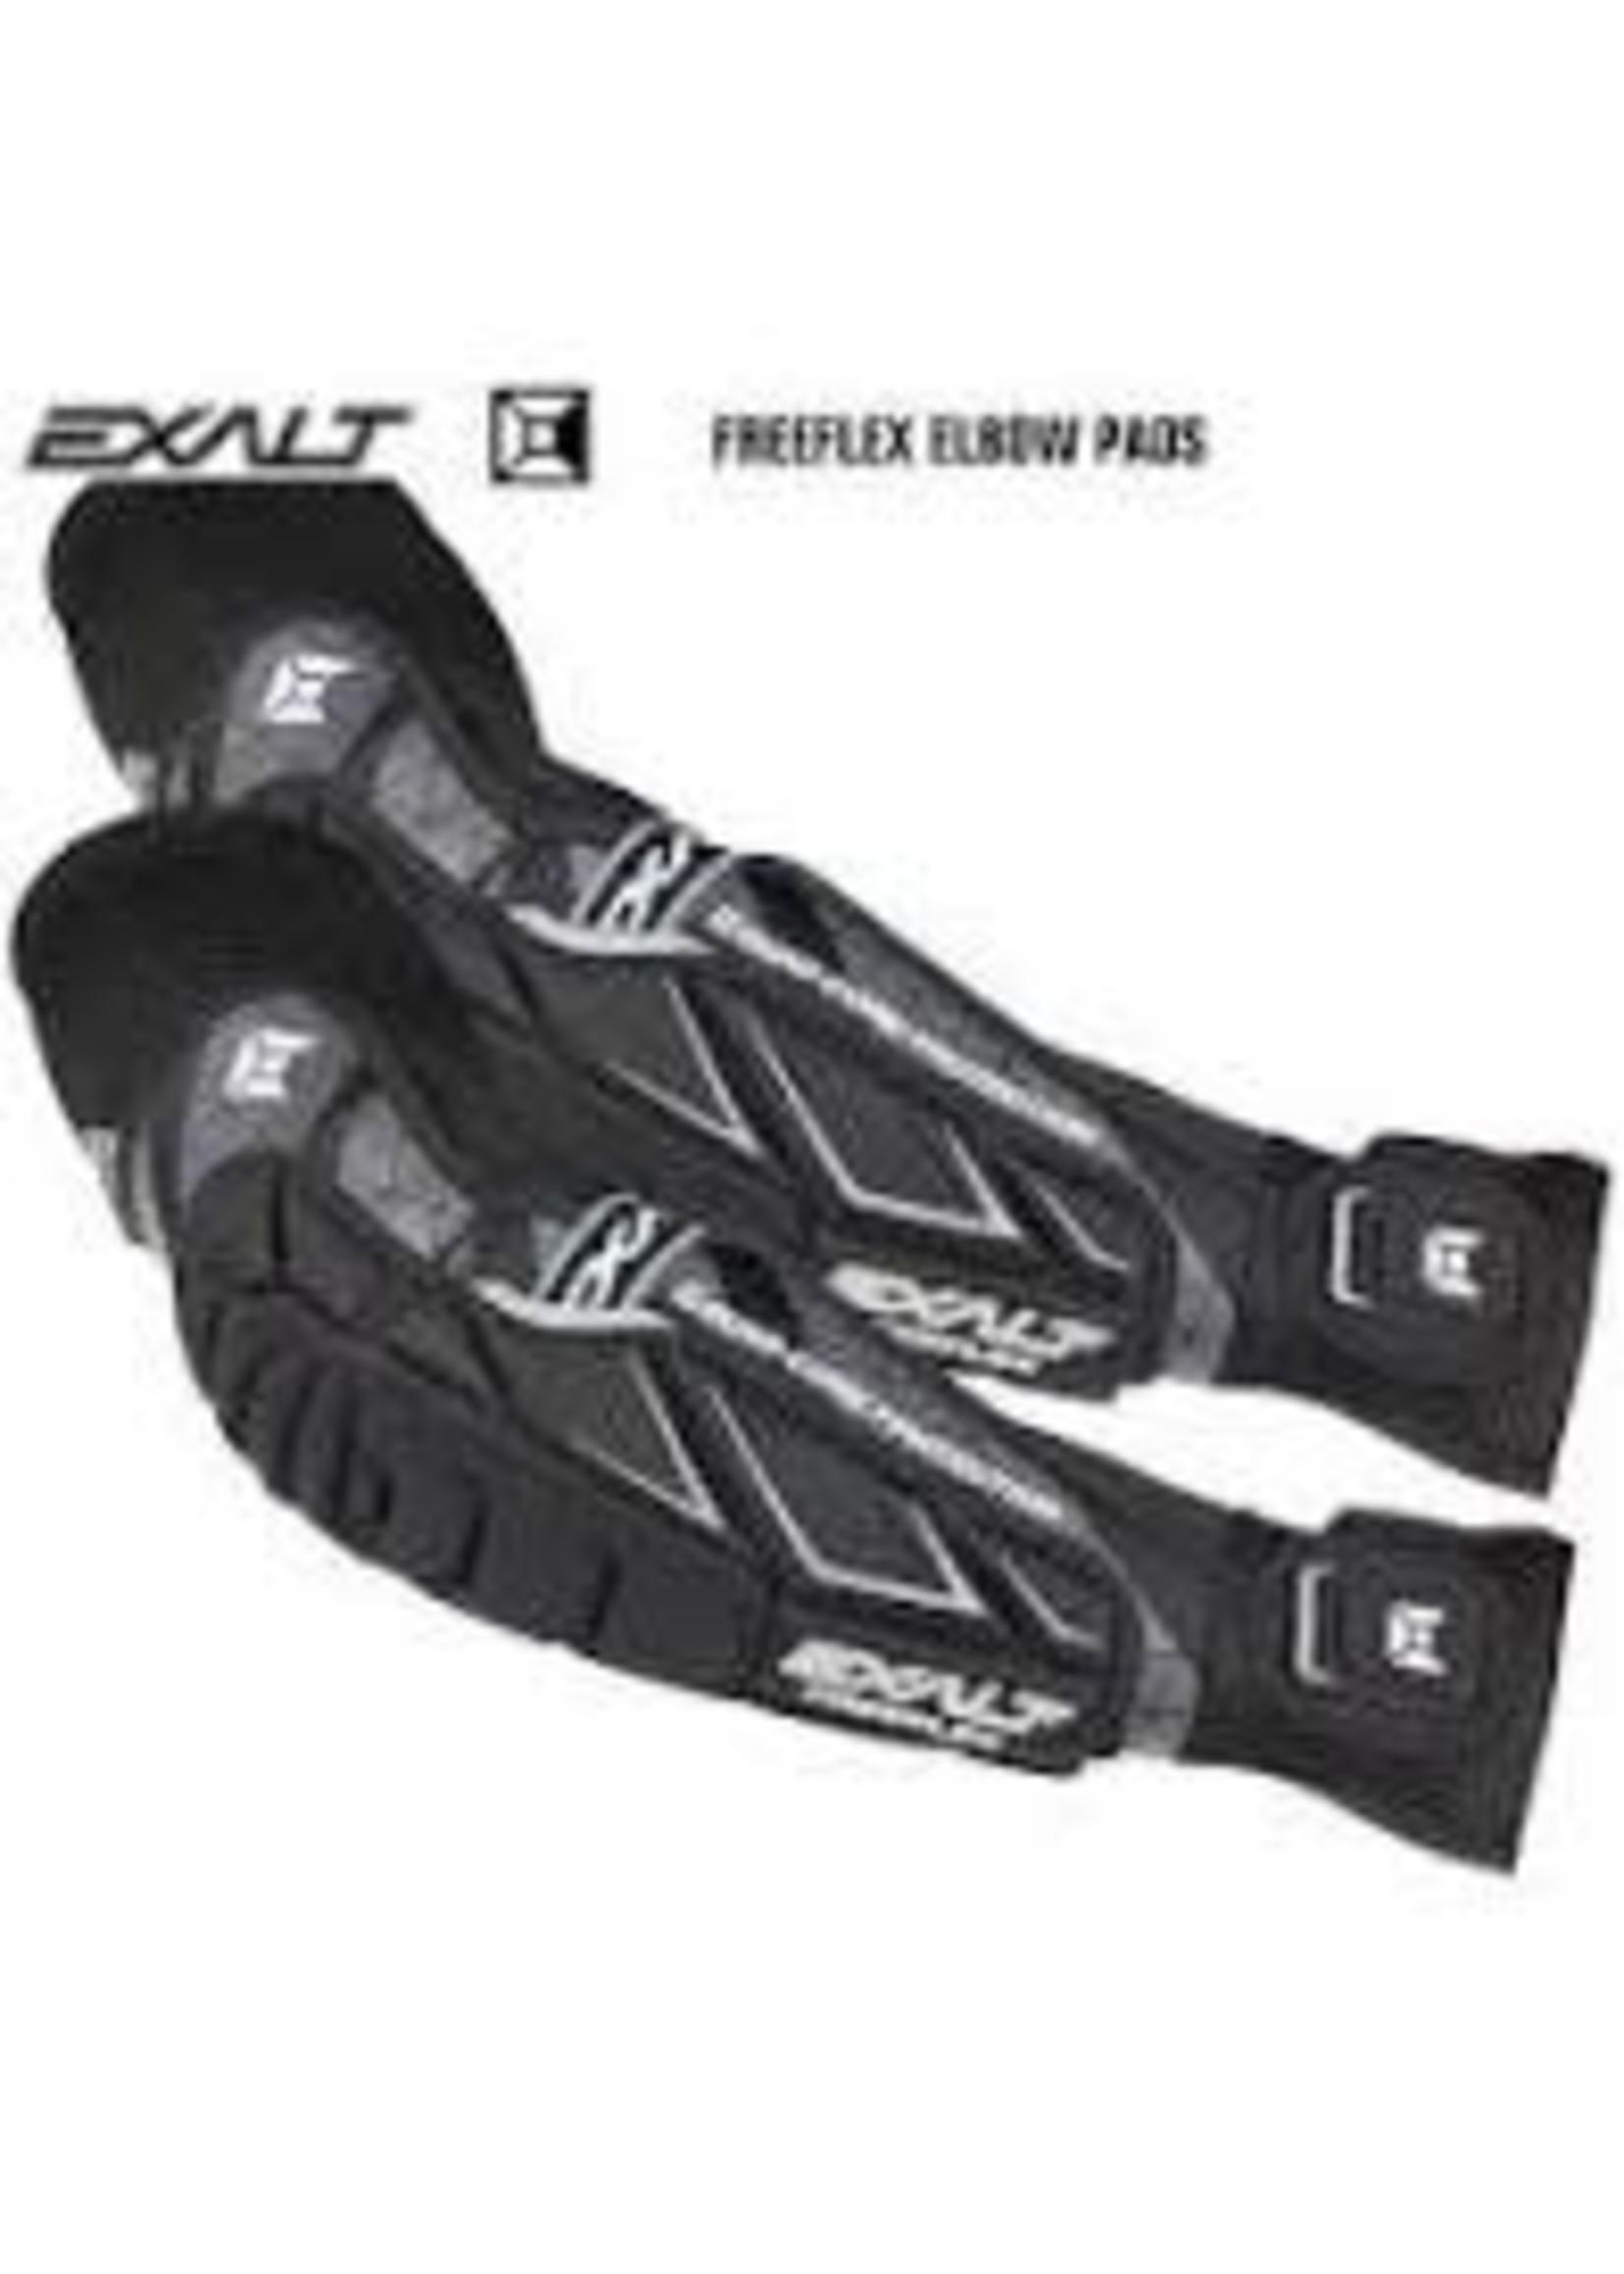 EXALT PAINTBALL EXALT FREEFLEX ELBOW PADS